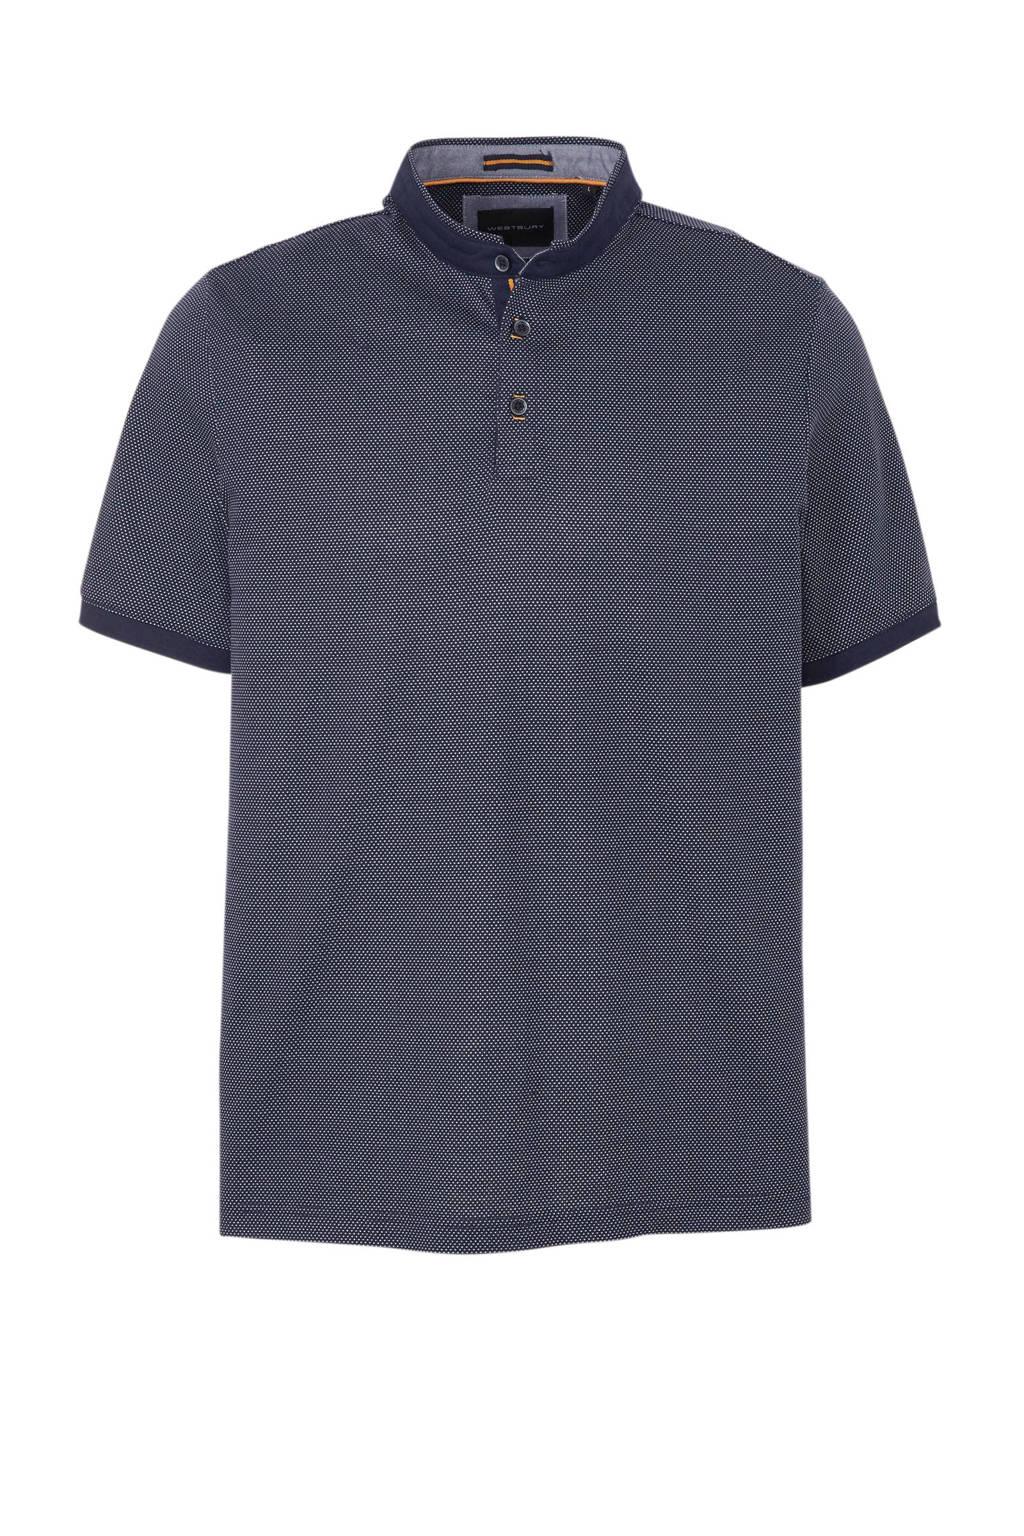 C&A Westbury T-shirt met all over print marine/ecru, Marine/ecru